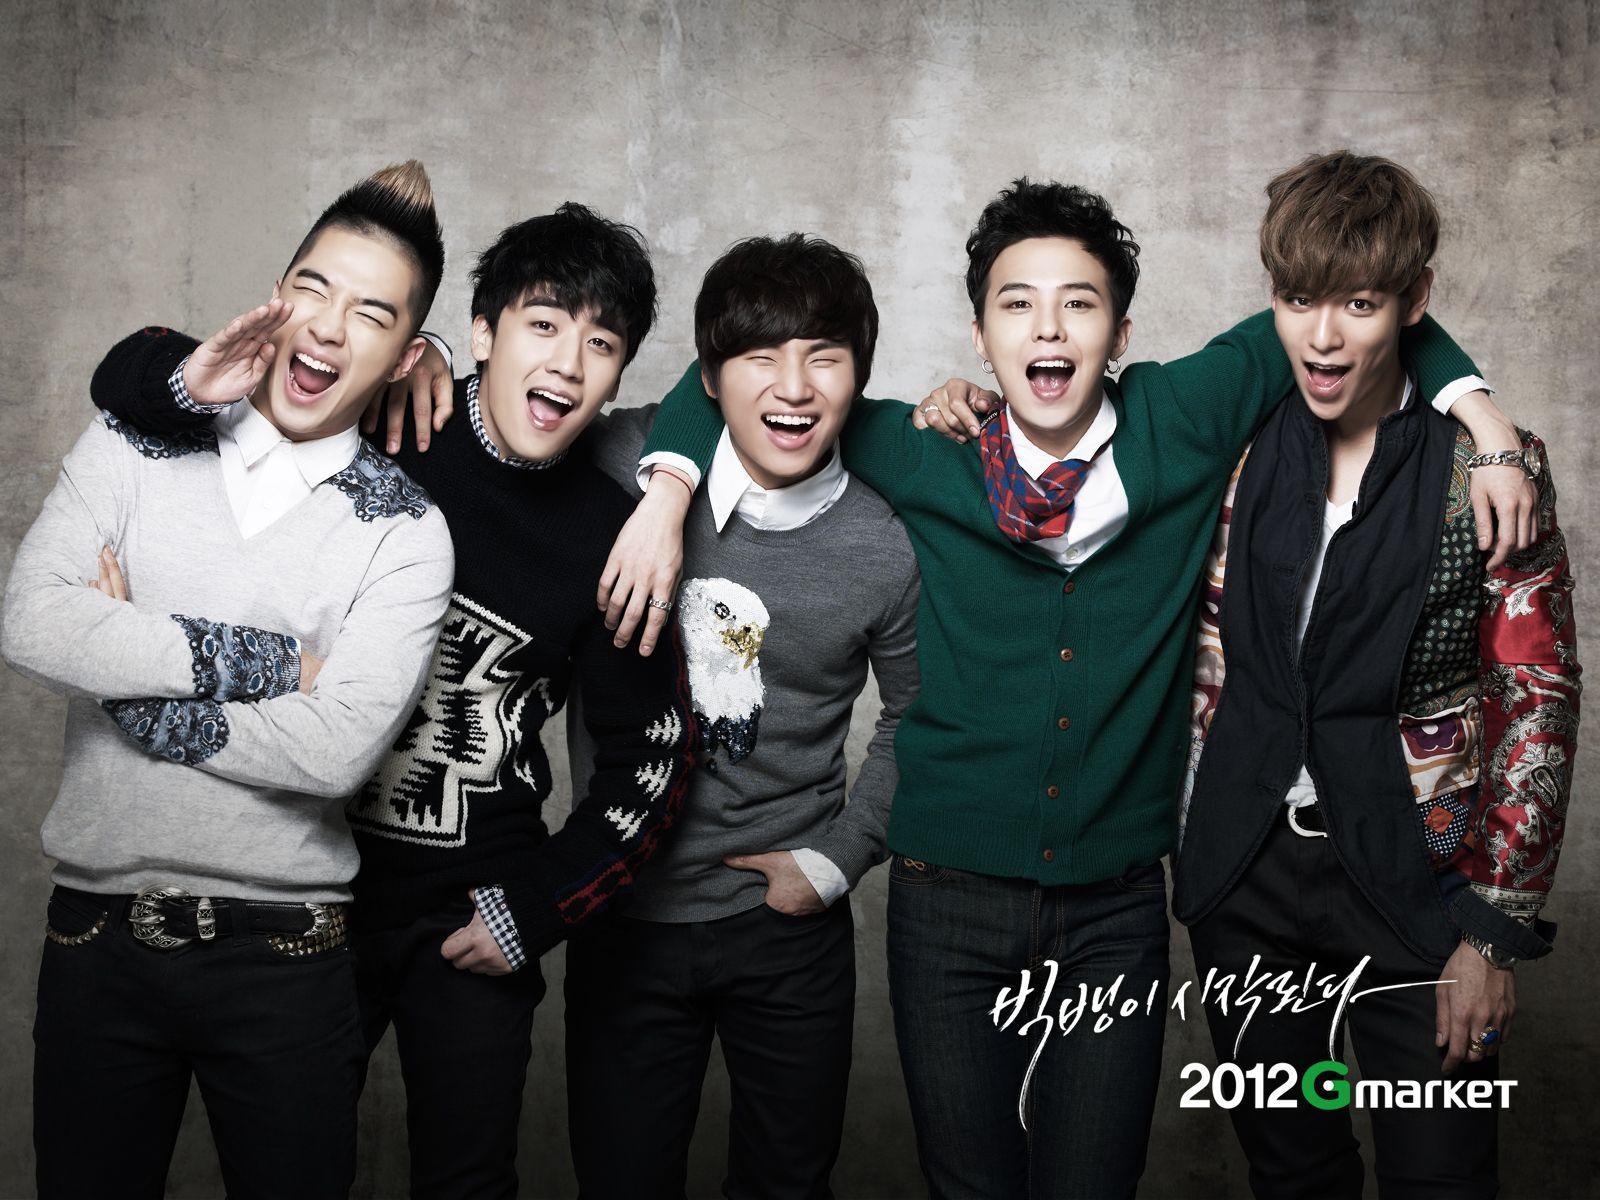 Big Bang K Pop Wallpapers Top Free Big Bang K Pop